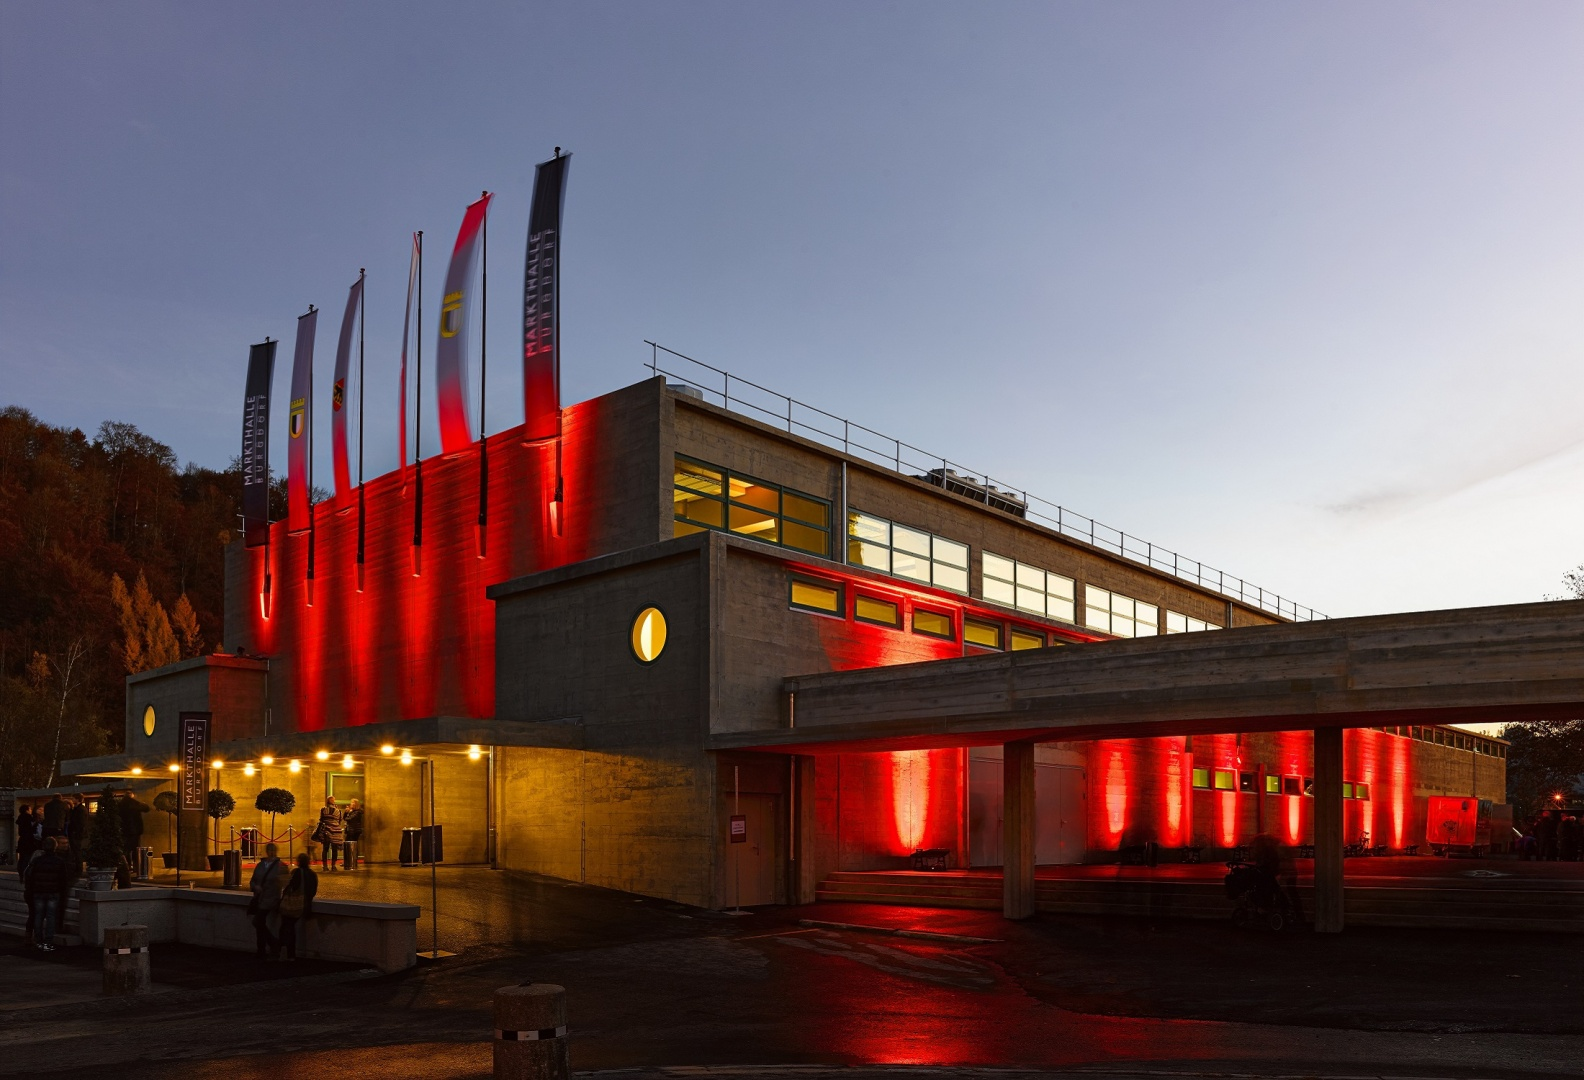 Markthalle, Fassade Nord bei Nacht © Manuel Stettler, Fotograf, Burgdorf